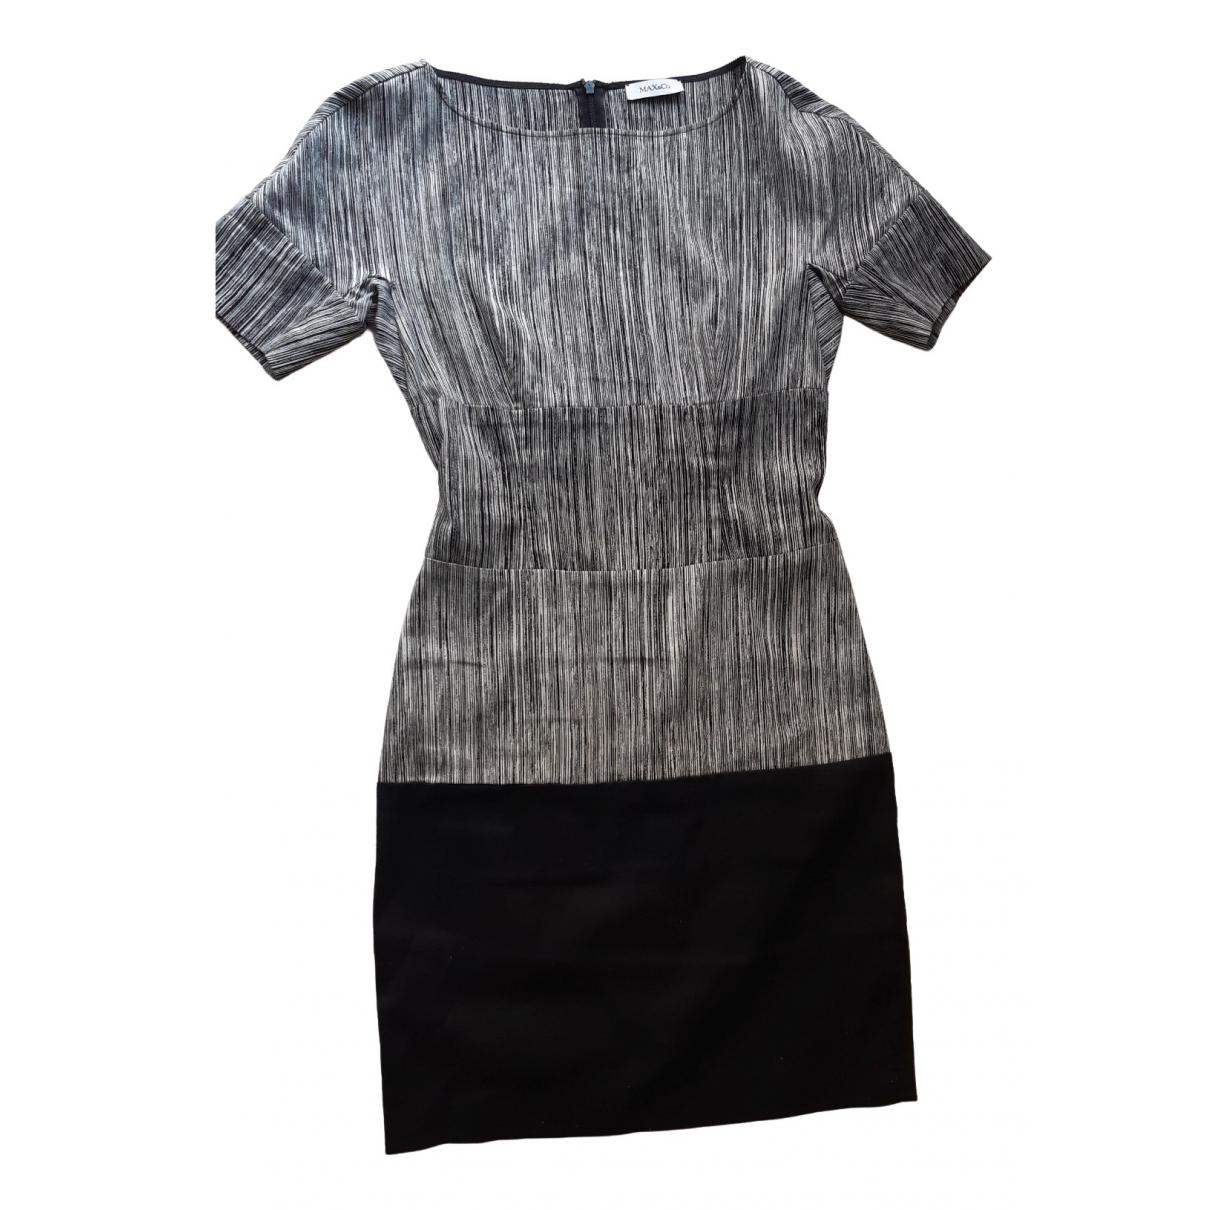 Max & Co \N Black Cotton - elasthane dress for Women 42 IT